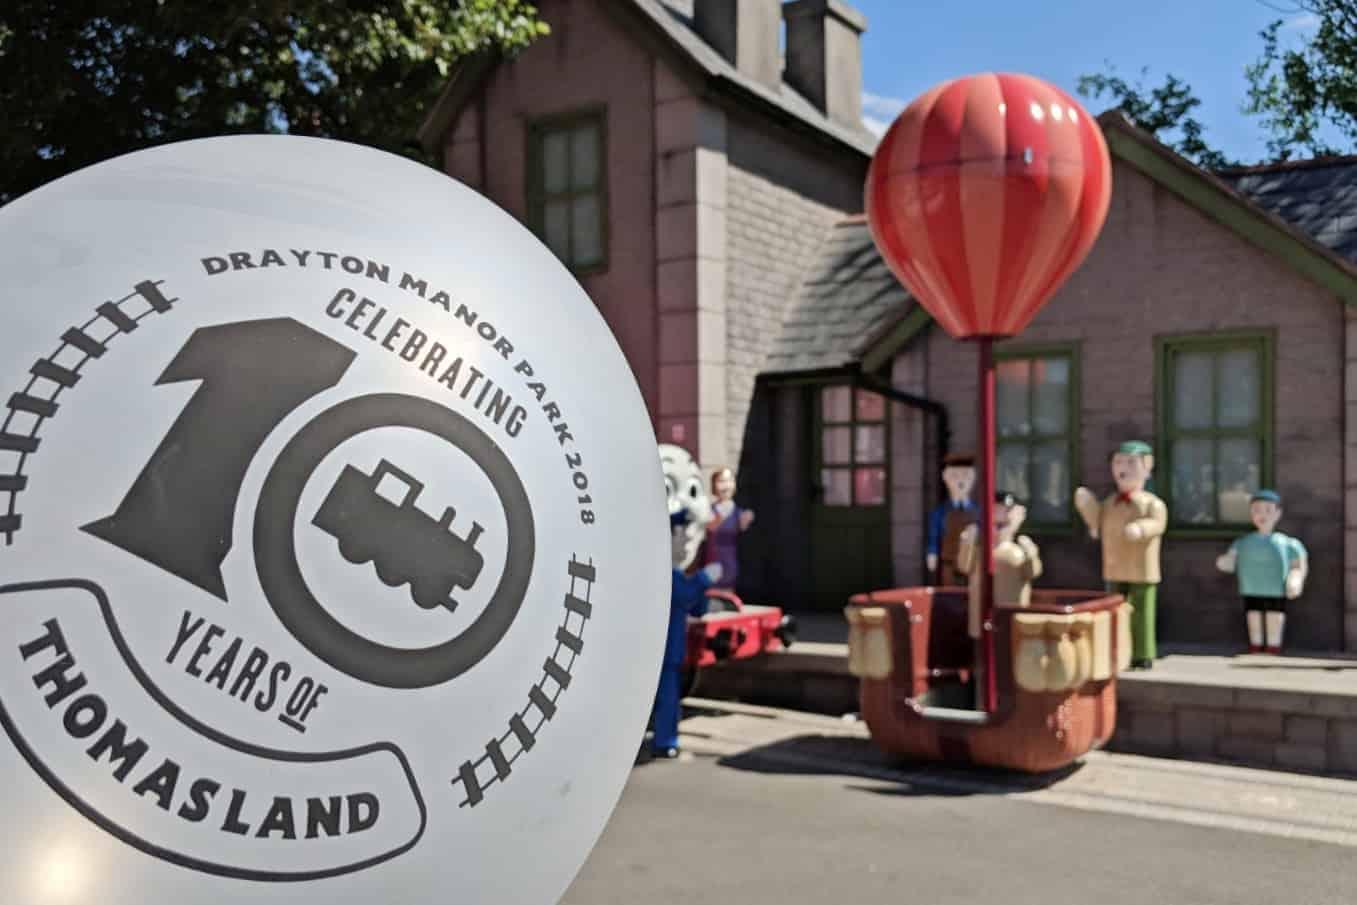 Celebrating 10 years of Thomas Land at Drayton Manor